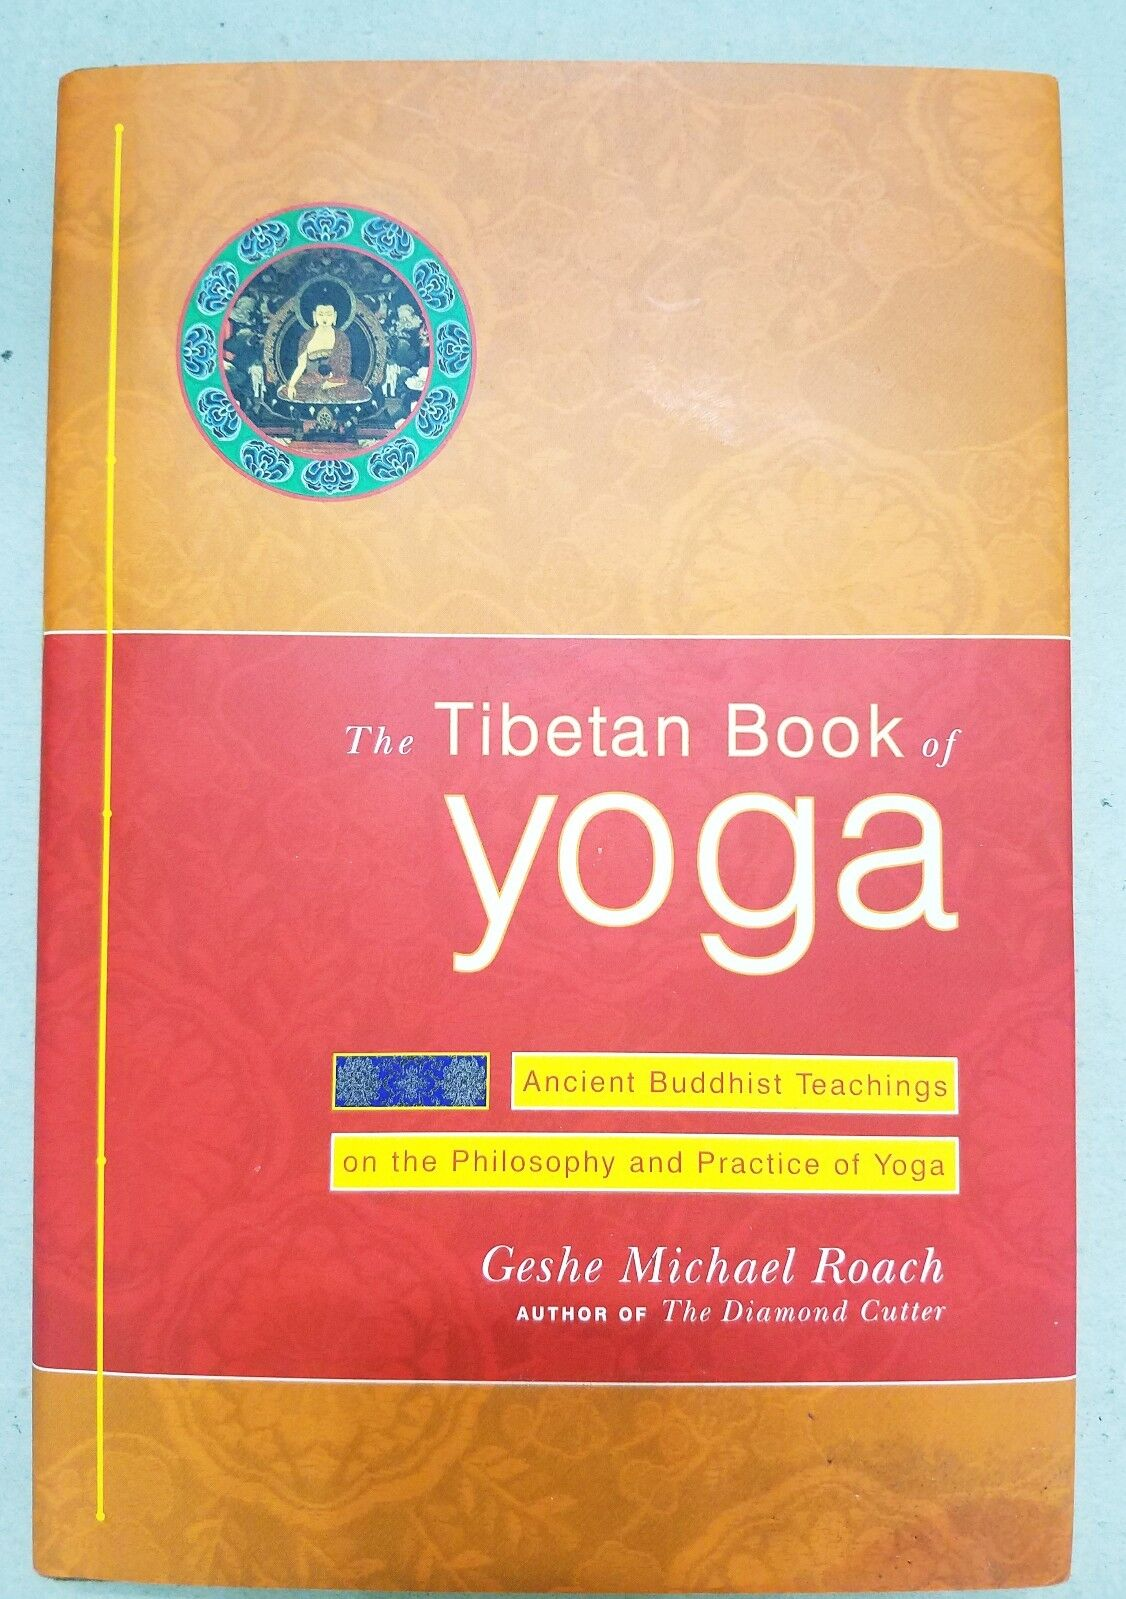 Krishnamacharya's Legacy: Modern Yoga's Inventor